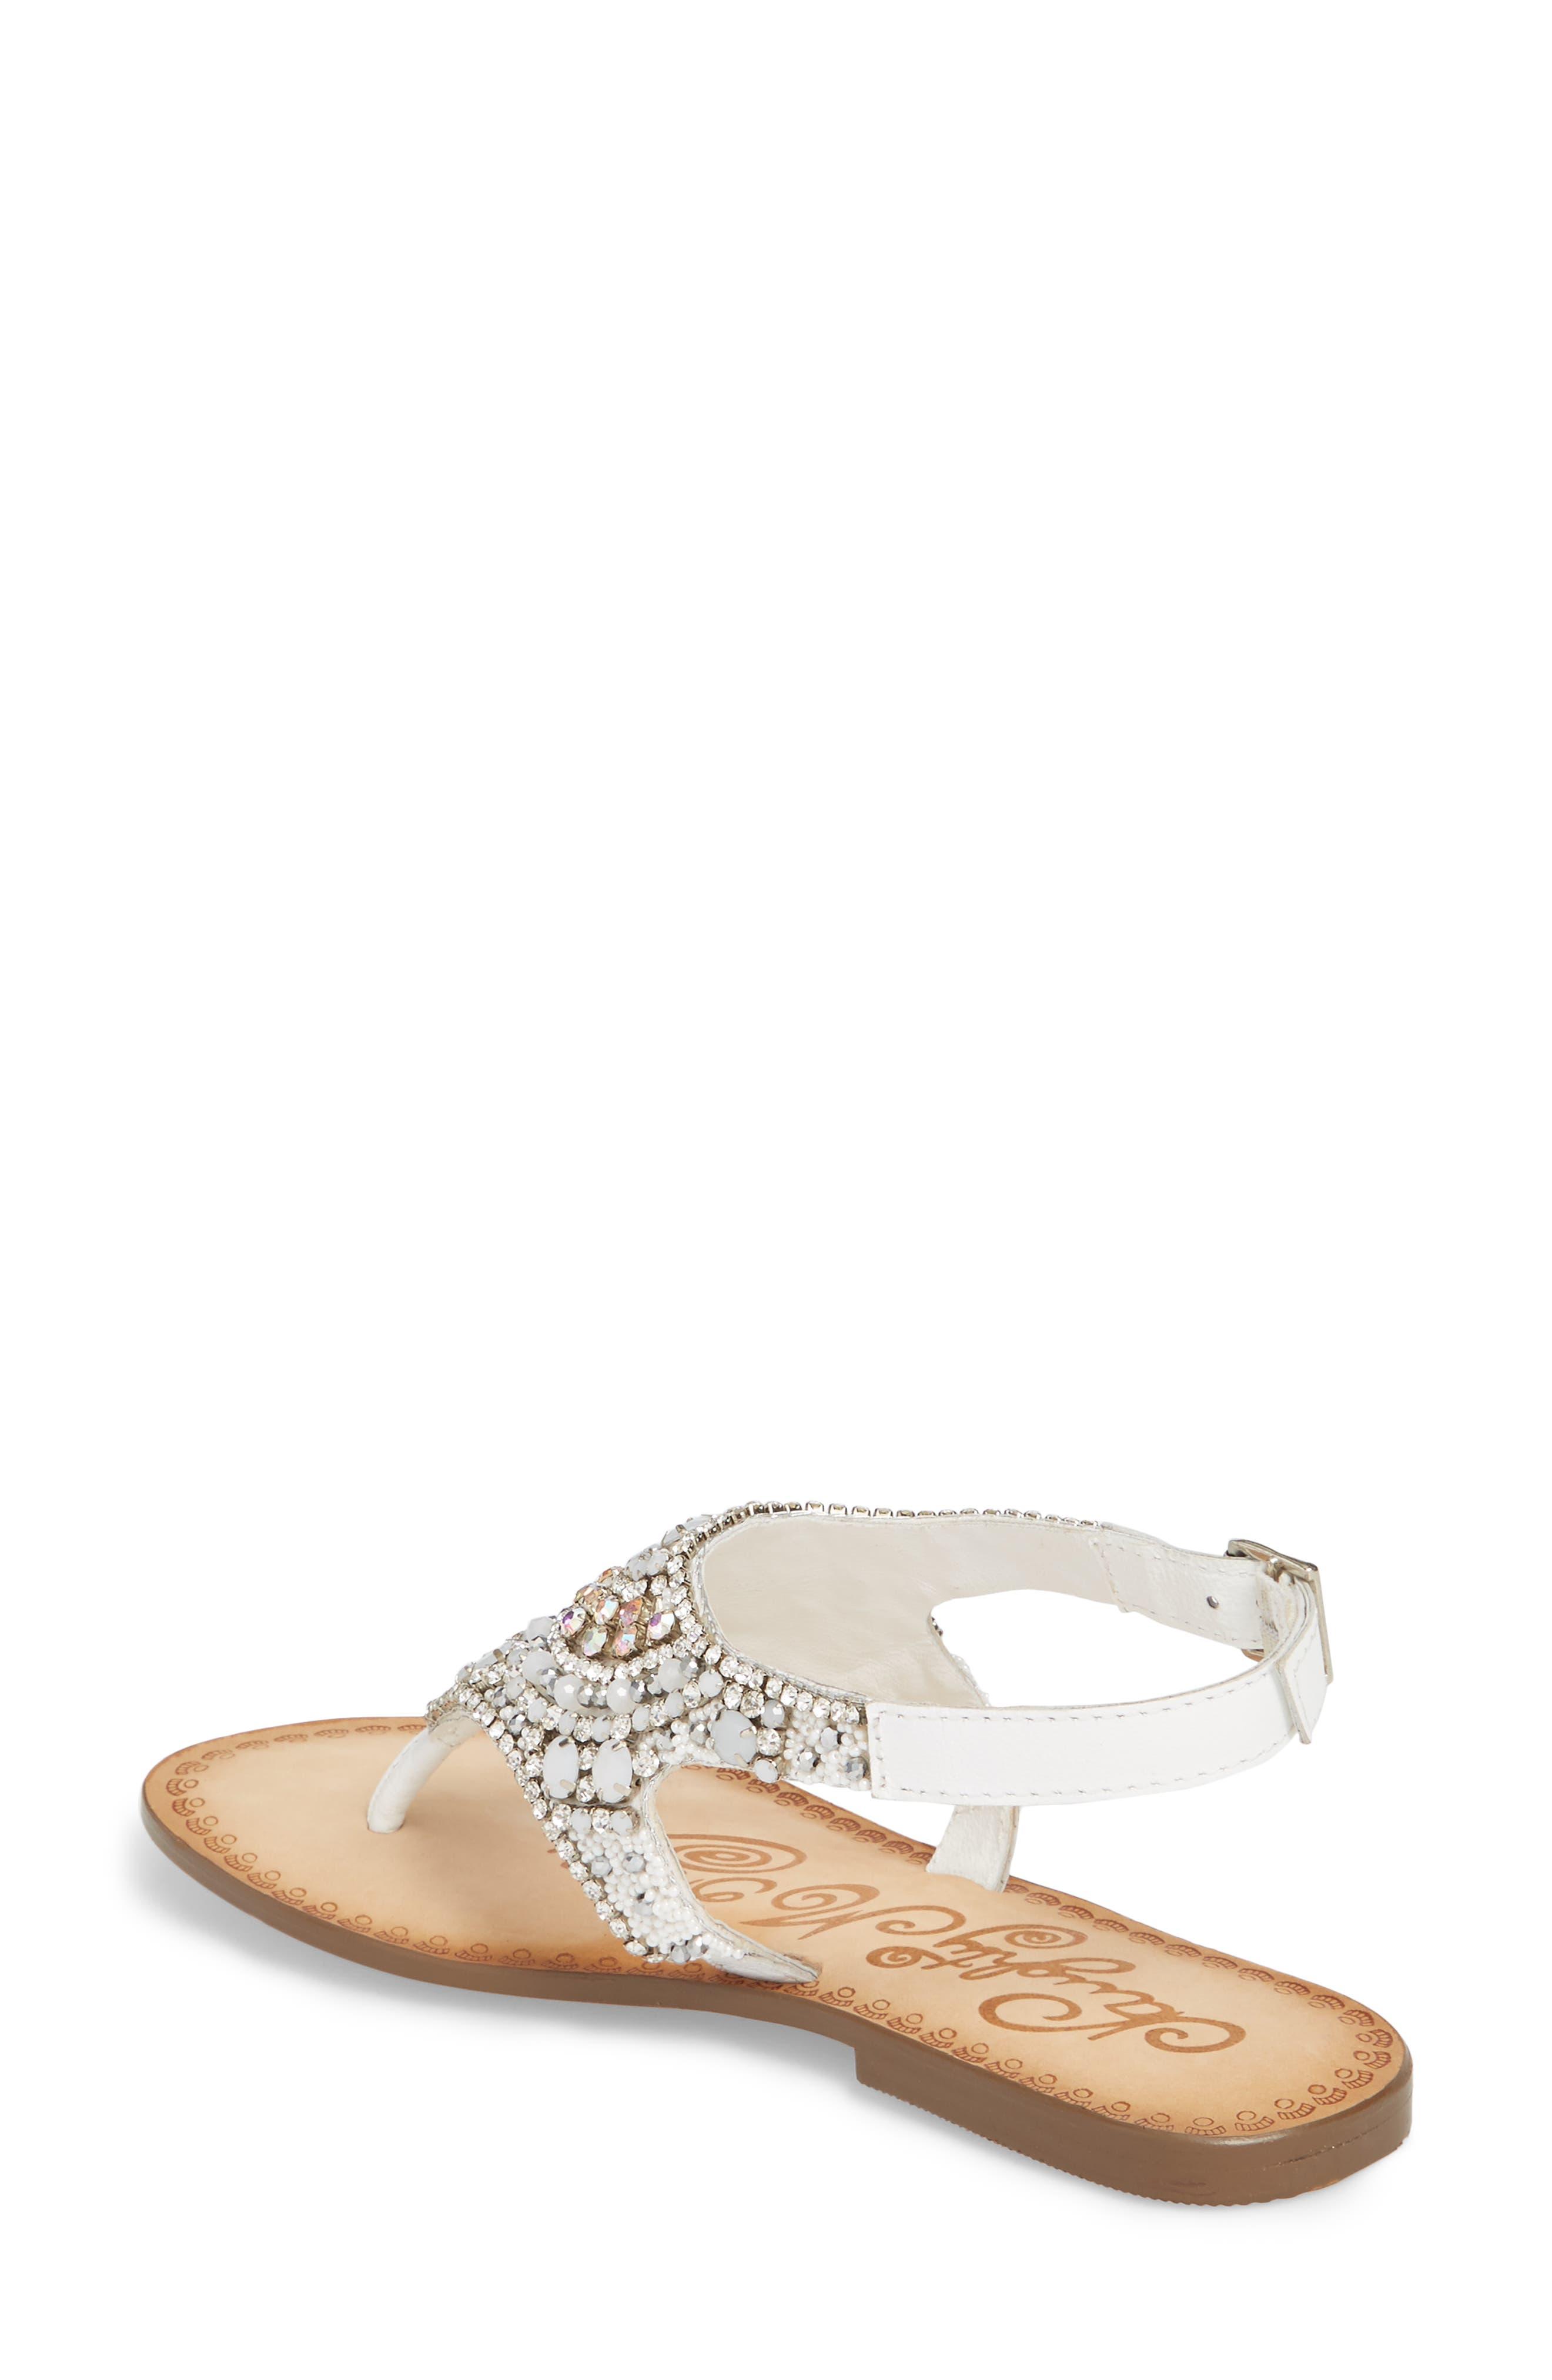 Iceberg Crystal Embellished Sandal,                             Alternate thumbnail 2, color,                             White Leather